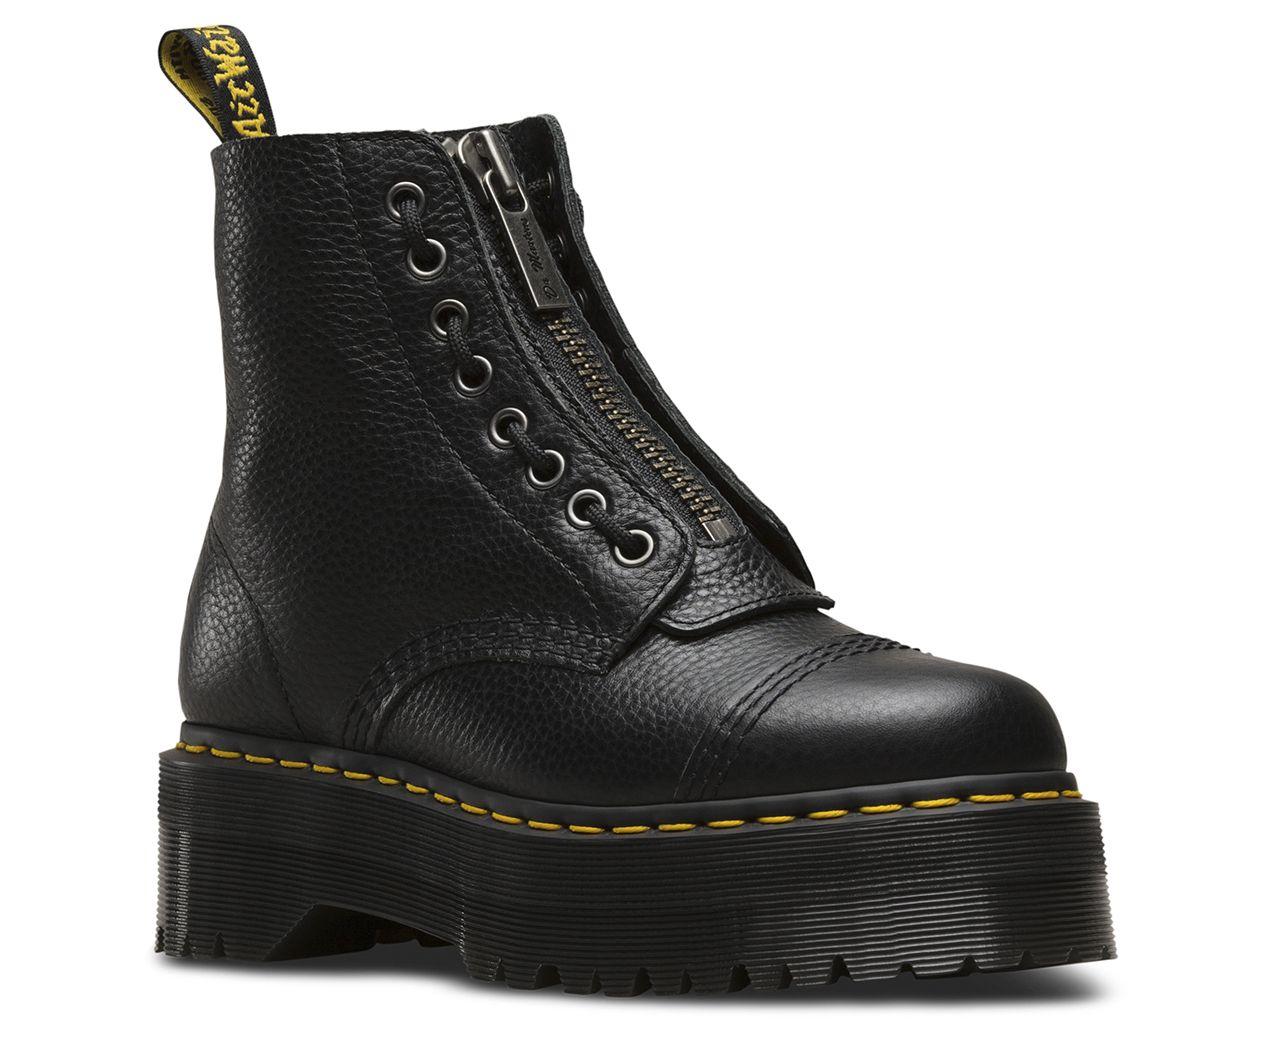 Bottes, bottines Femmes: chaussures DOC Dr MARTENS Bottes